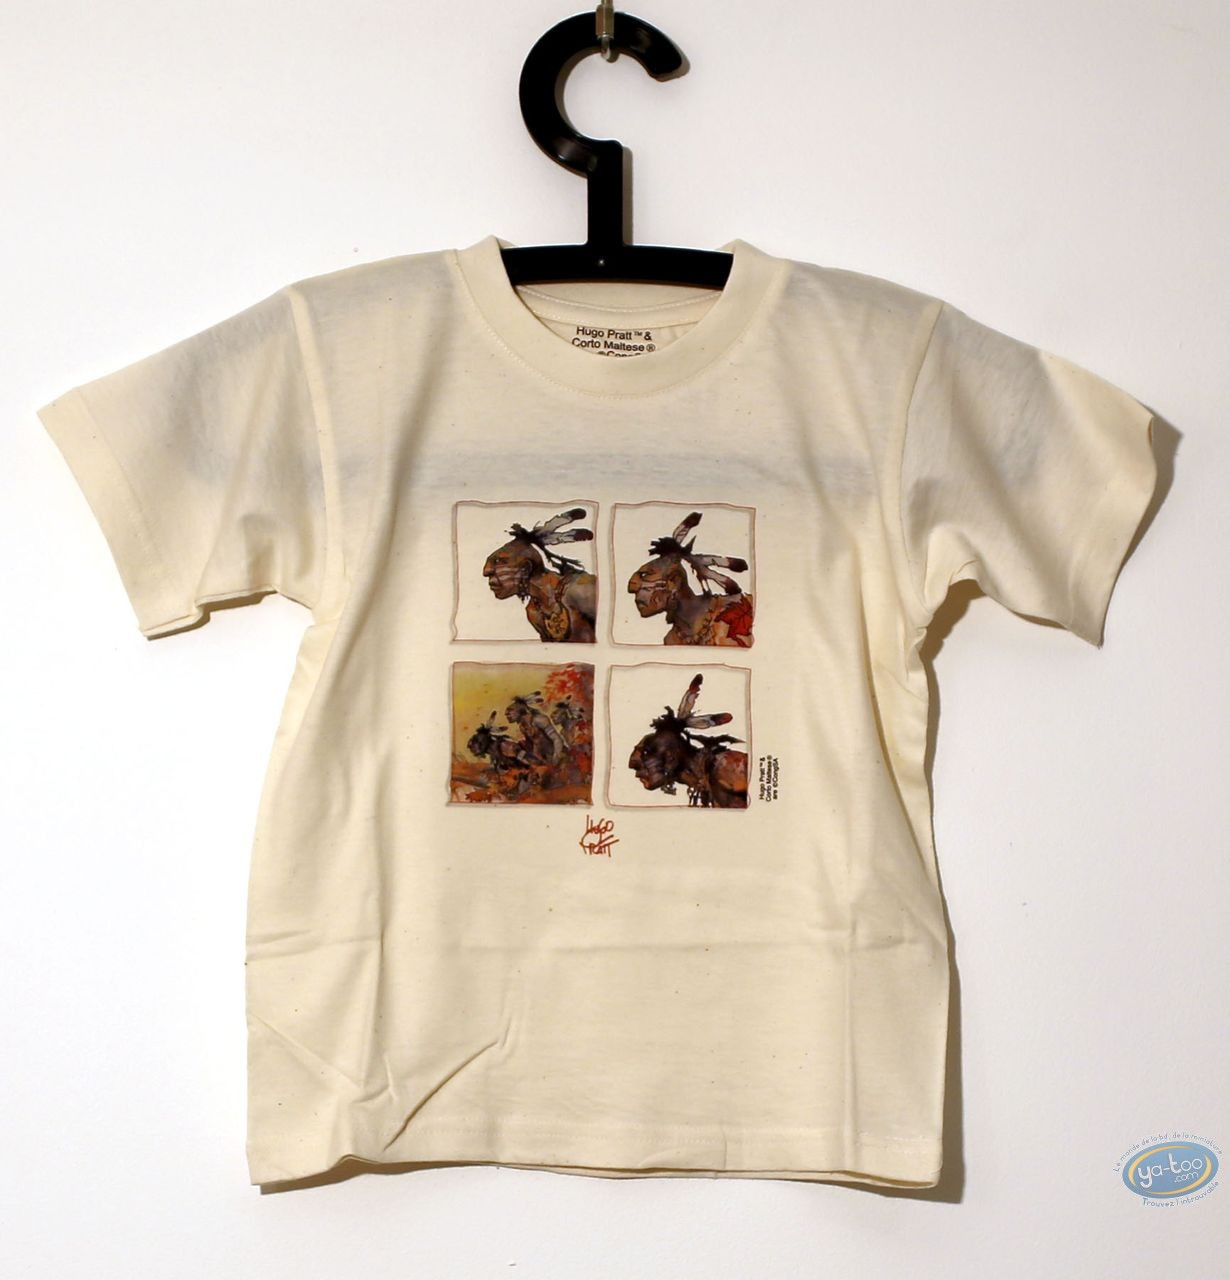 Vêtement, Corto Maltese : T-shirt, Kid 06/03 - 7/8 ans